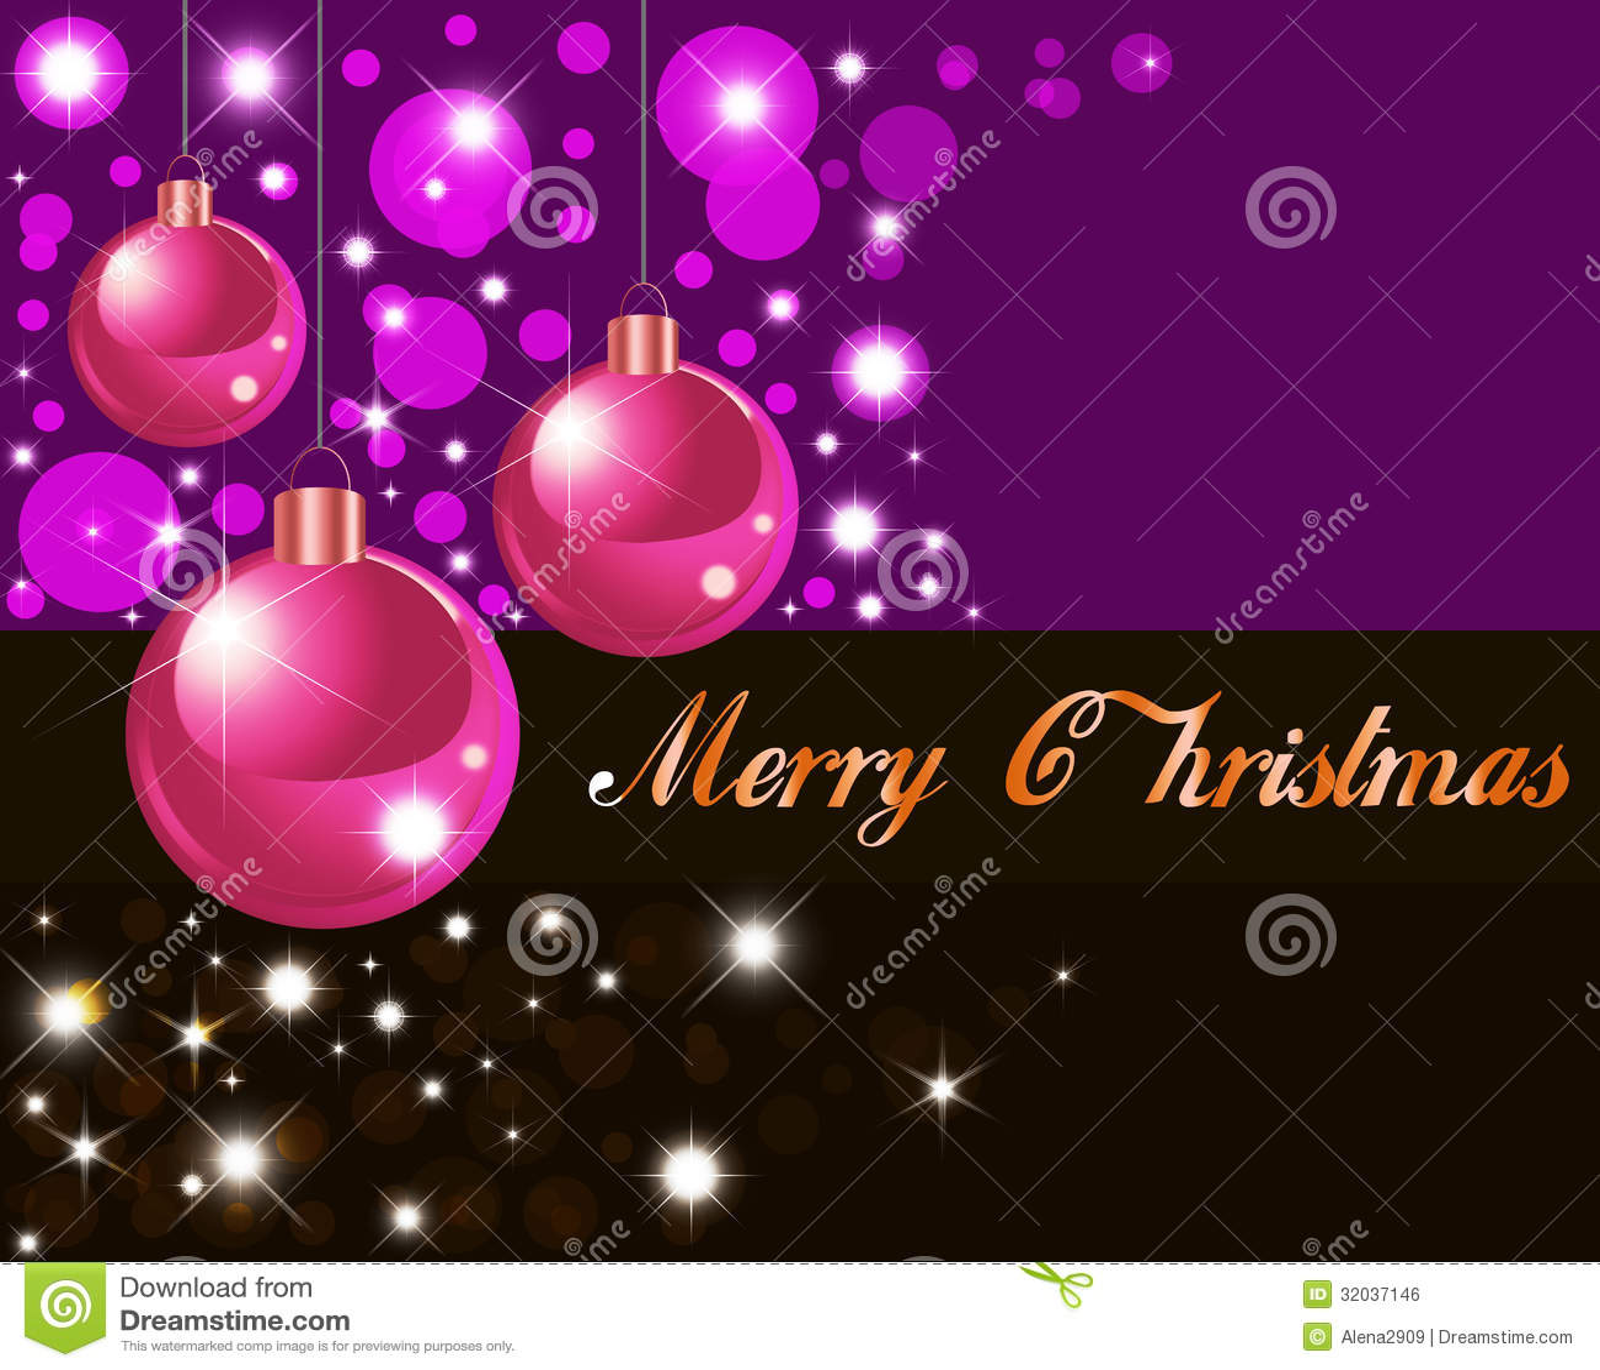 Greeting Christmas Card 2015 Stock Illustration Image